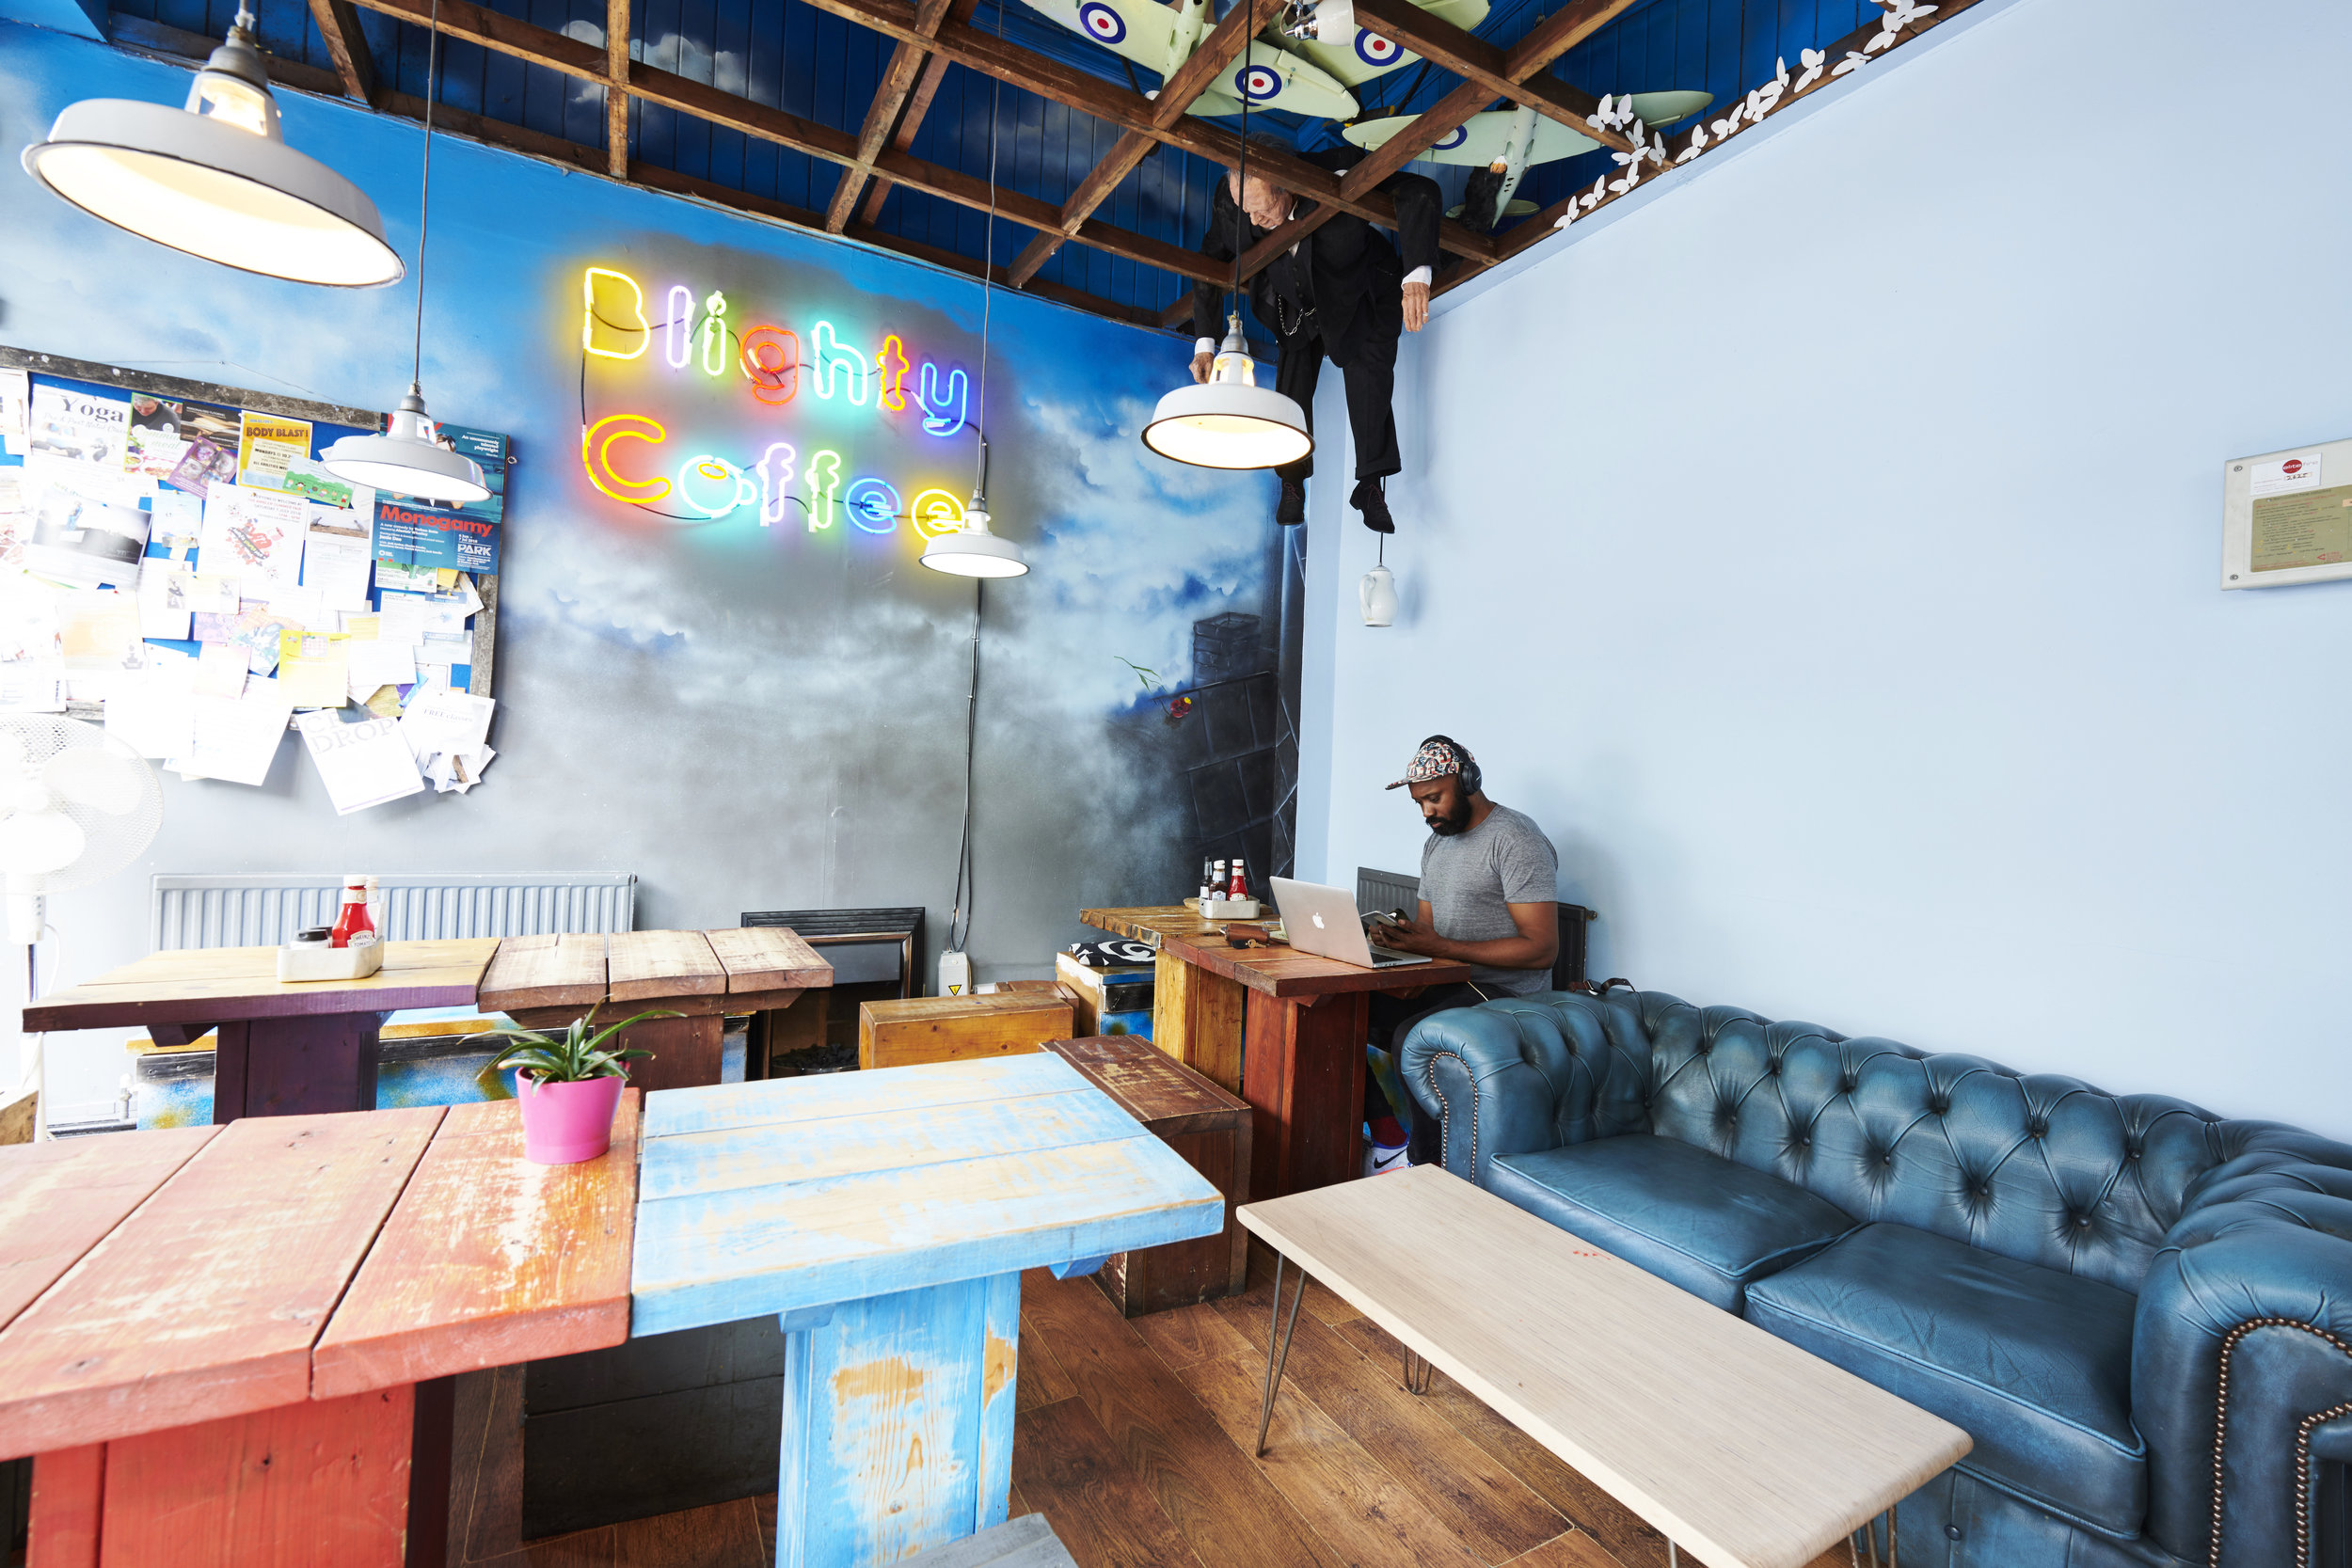 Blighty Cafe